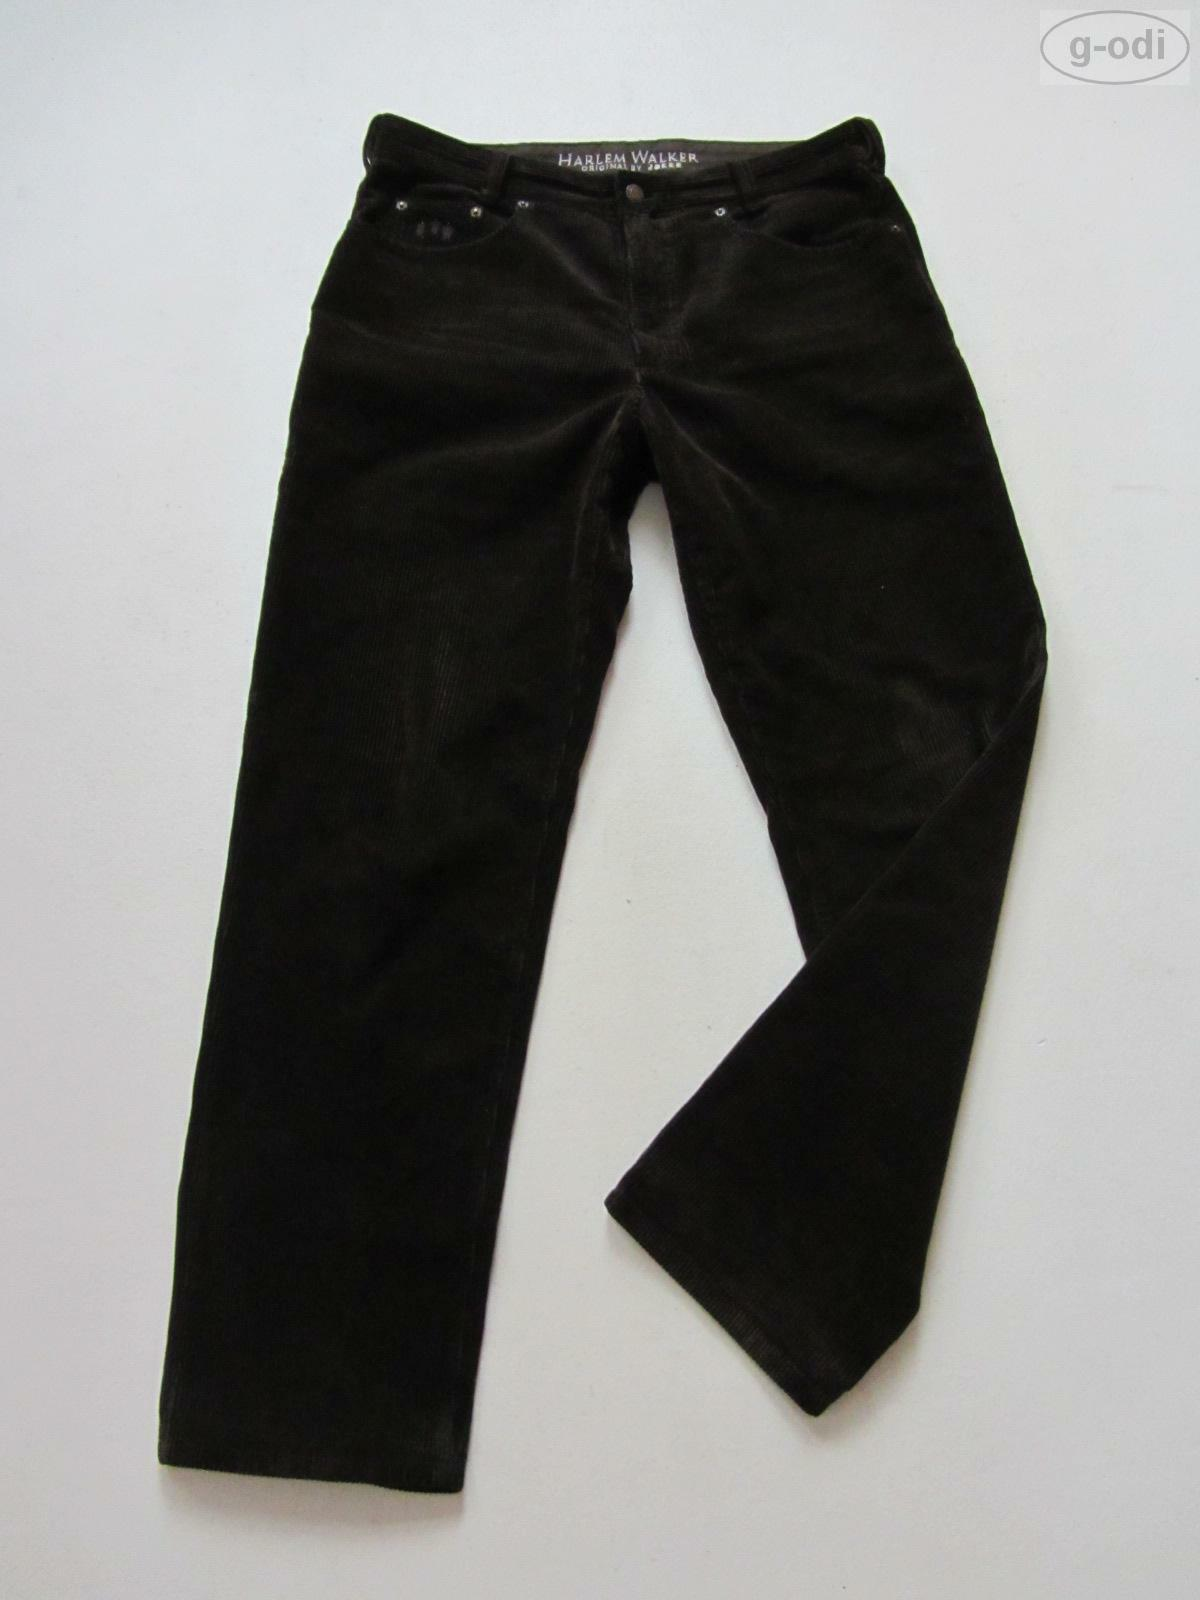 JOKER Jeans Harlem Walker Cord Hose W 34  L 32 braun TOP   robuste Cordhose